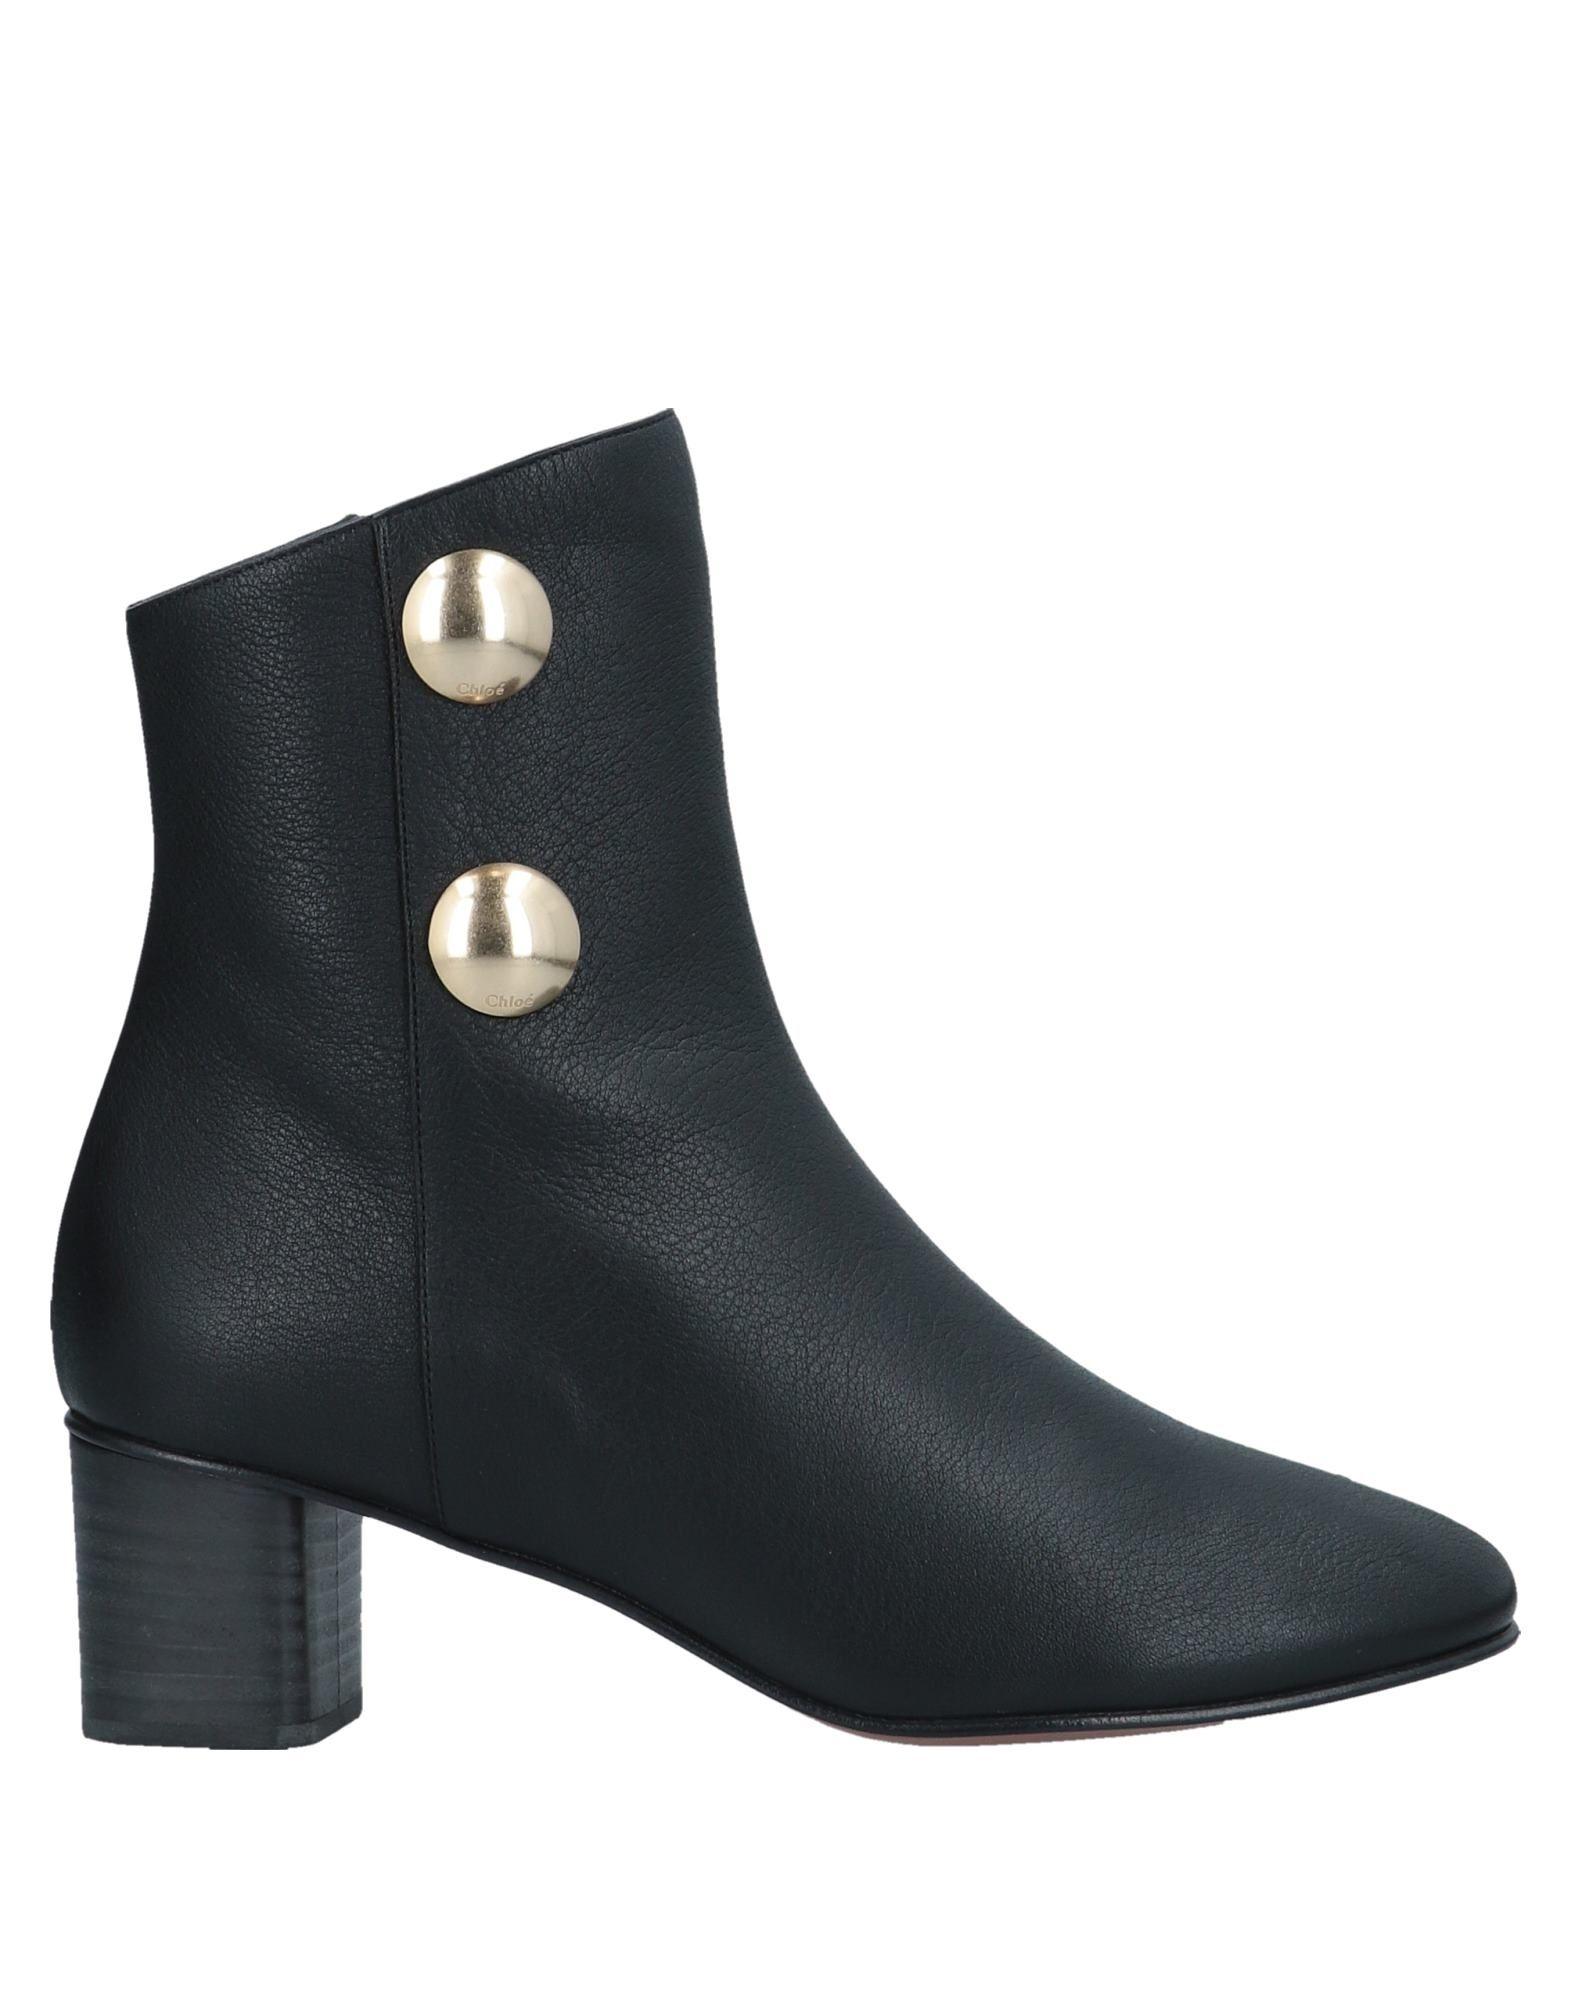 Chloé Ankle Boot Boots - Women Chloé Ankle Boots Boot online on  Australia - 11556108HV e40115